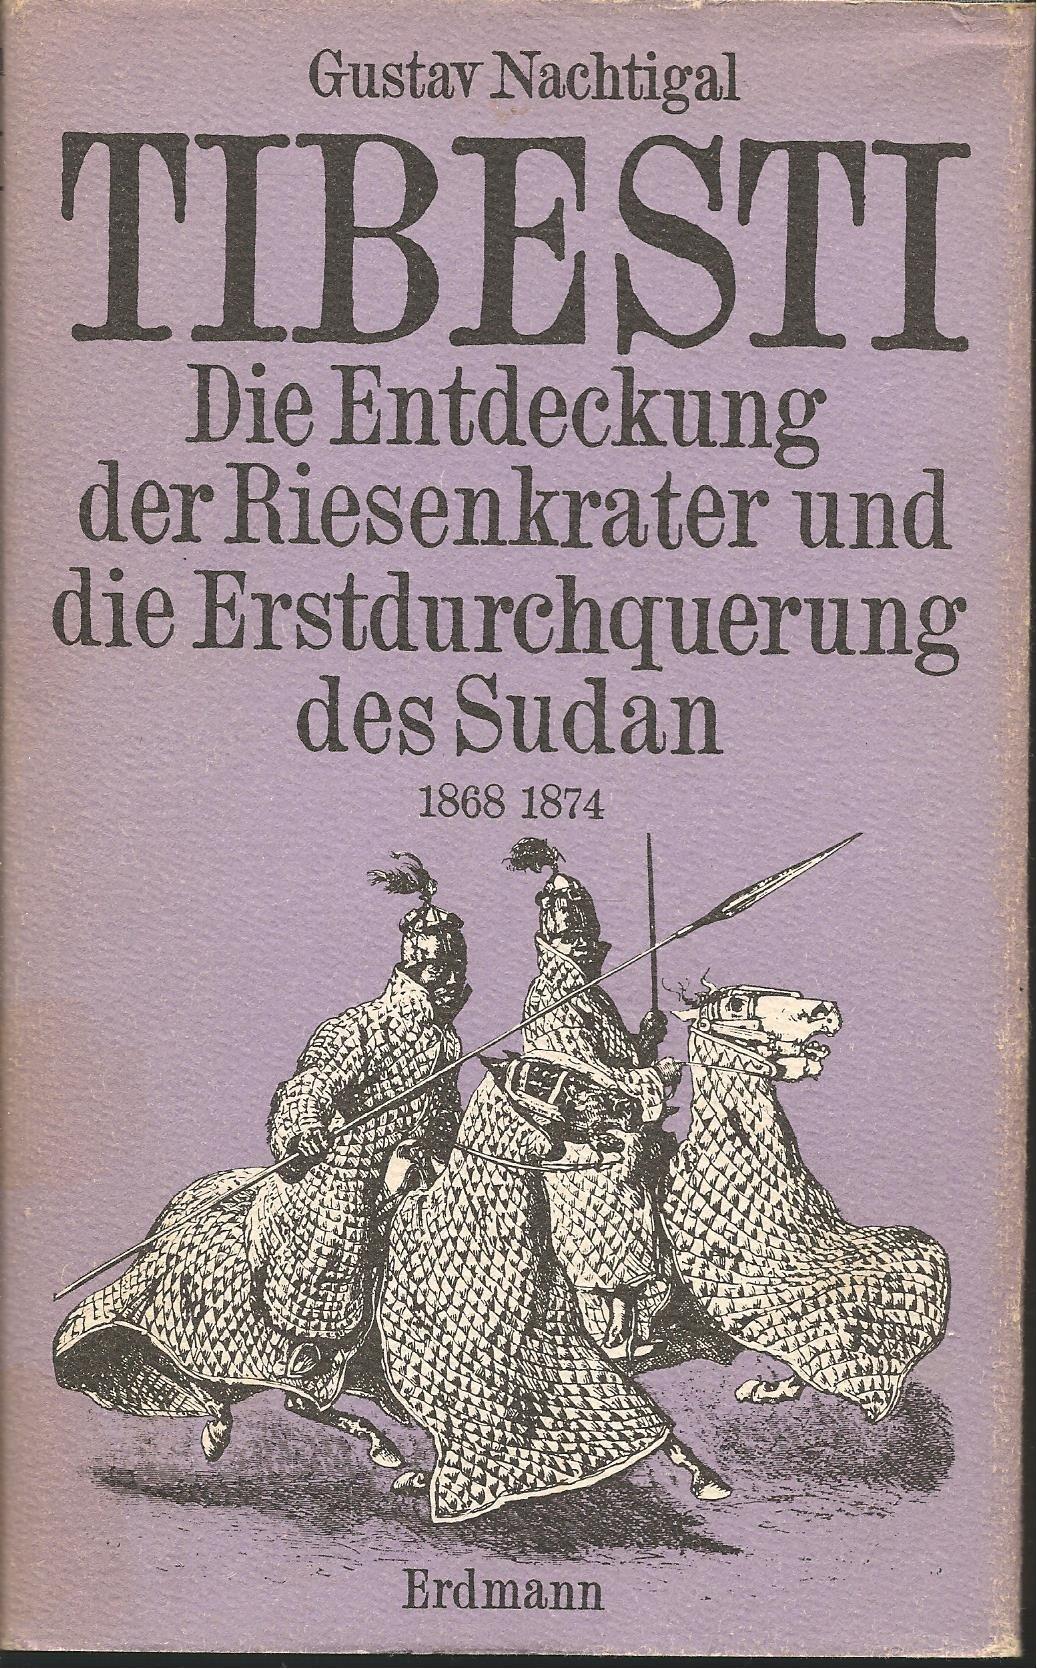 Tibesti: D. Entdeckung d. Riesenkrater u. d. Erstdurchquerung d. Sudan 1868 - 1874 (Alte abenteuerliche Reiseberichte) (German Edition)